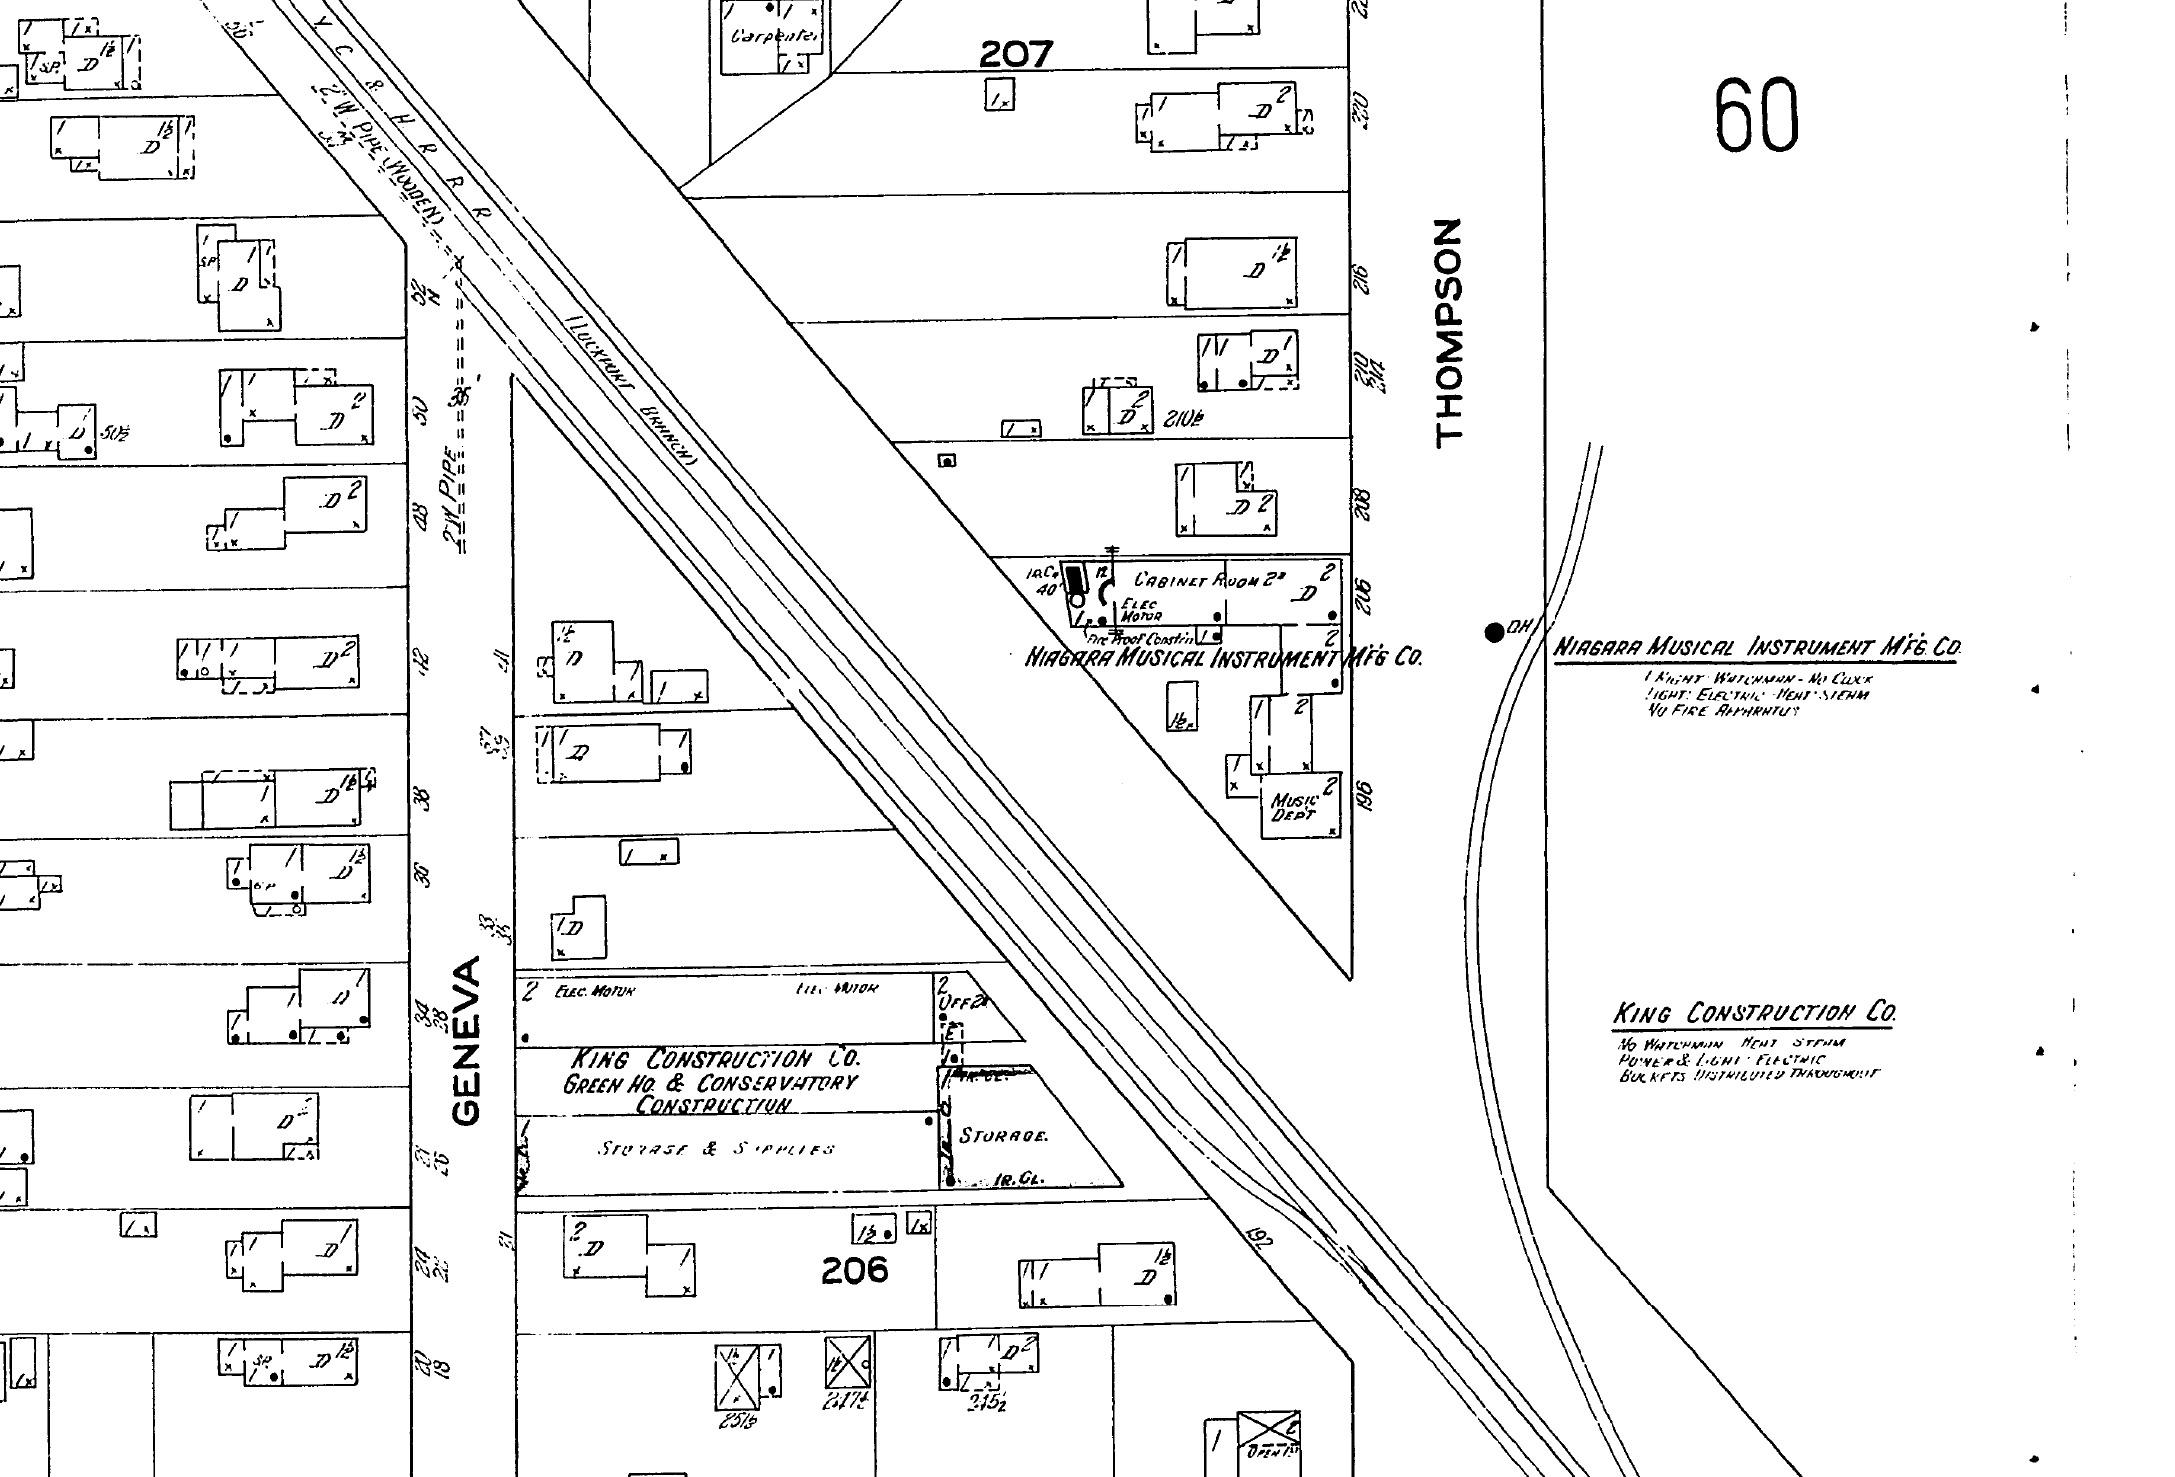 Niagara Musical Instrument Mfg Co, hi-res map (Sanborn Map Company, 1910).jpg